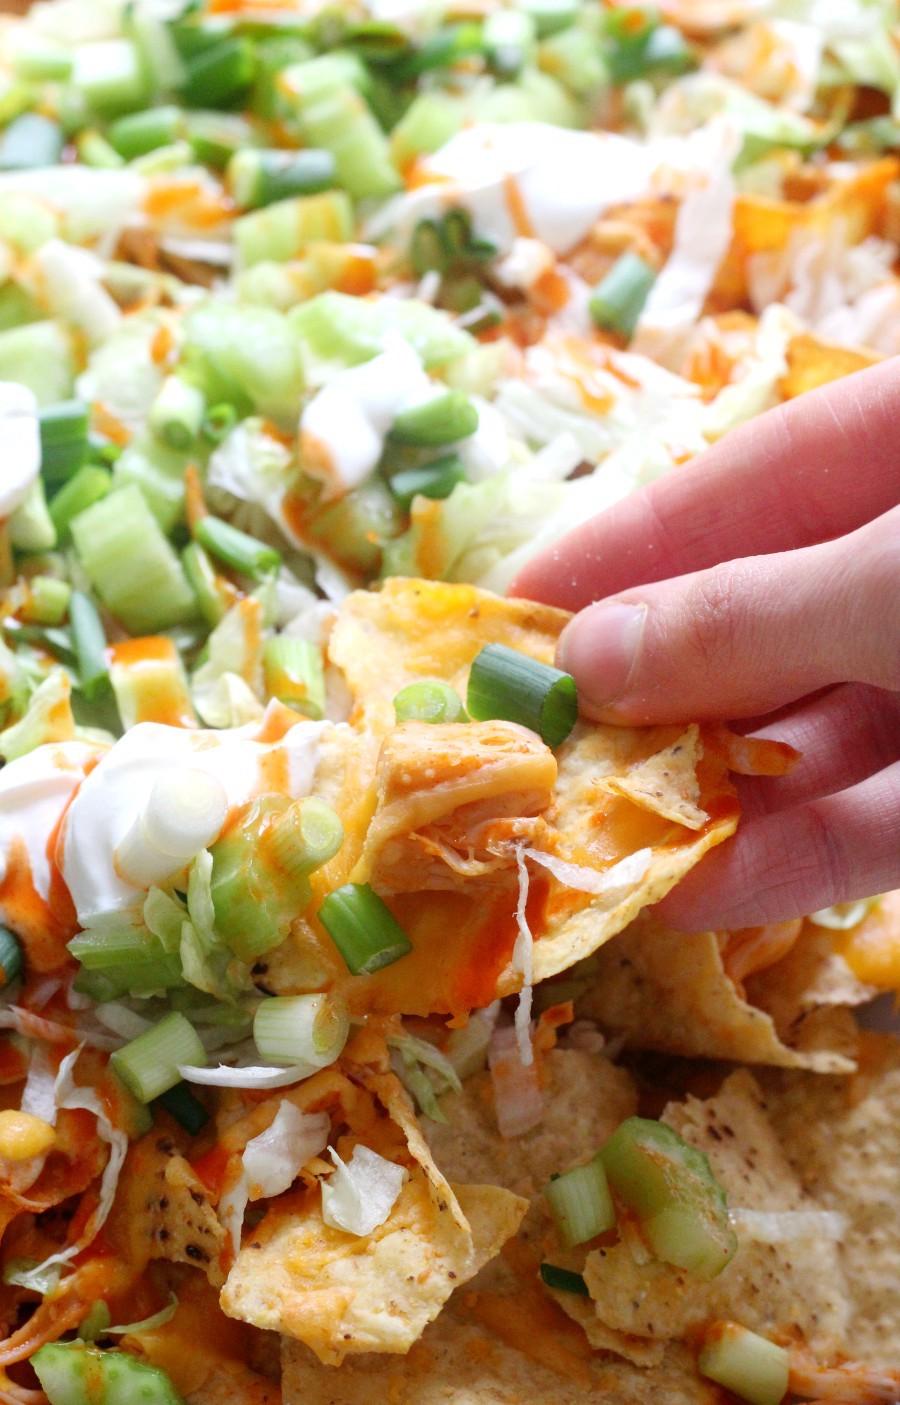 close-up-hand-grabbing-vegan-buffalo-chicken-nachos